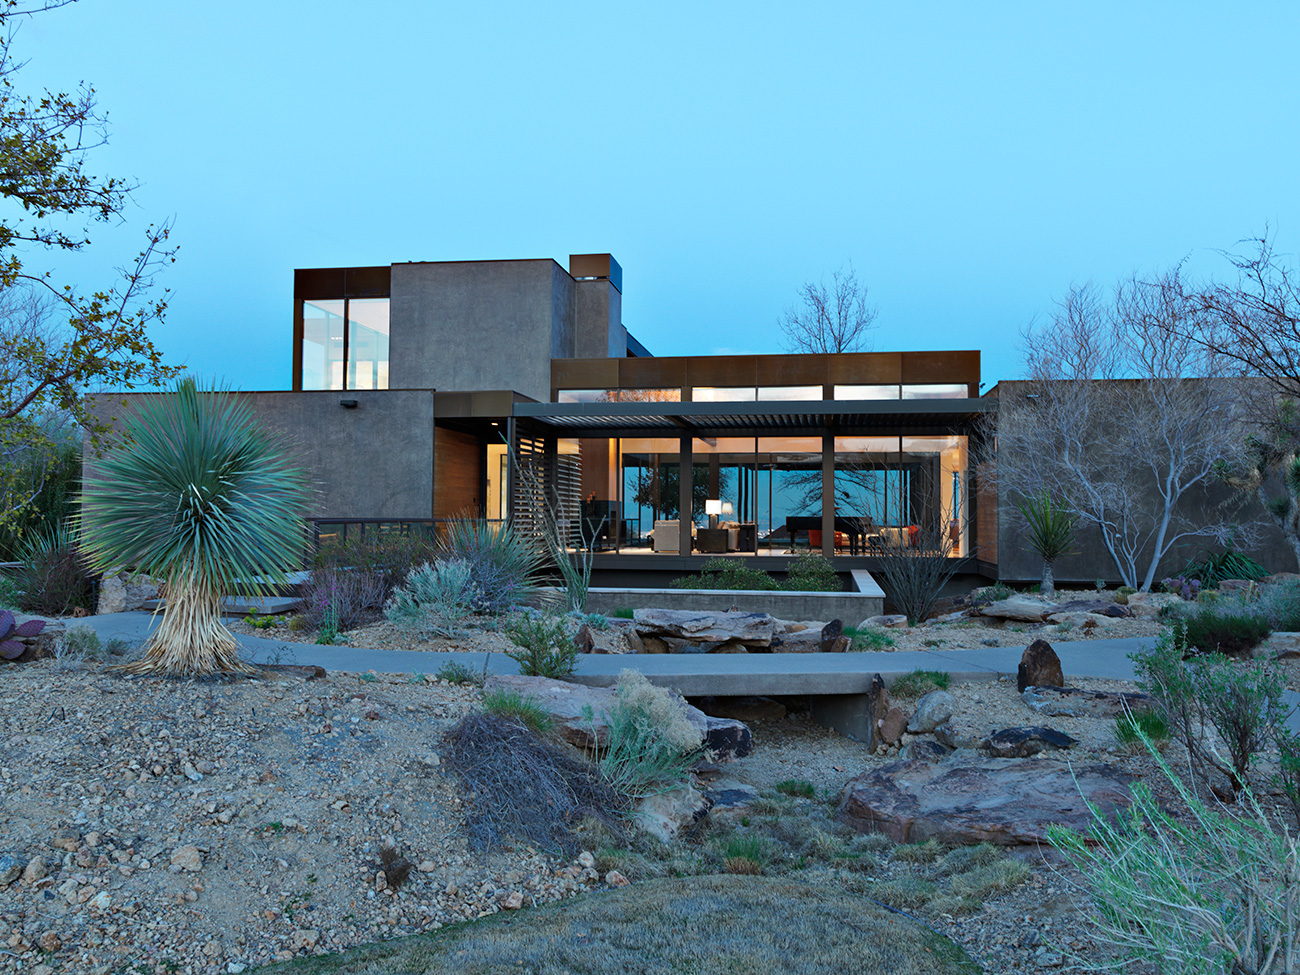 Site: Marmol Radziner in the Landscape Las Vegas prefab house exterior